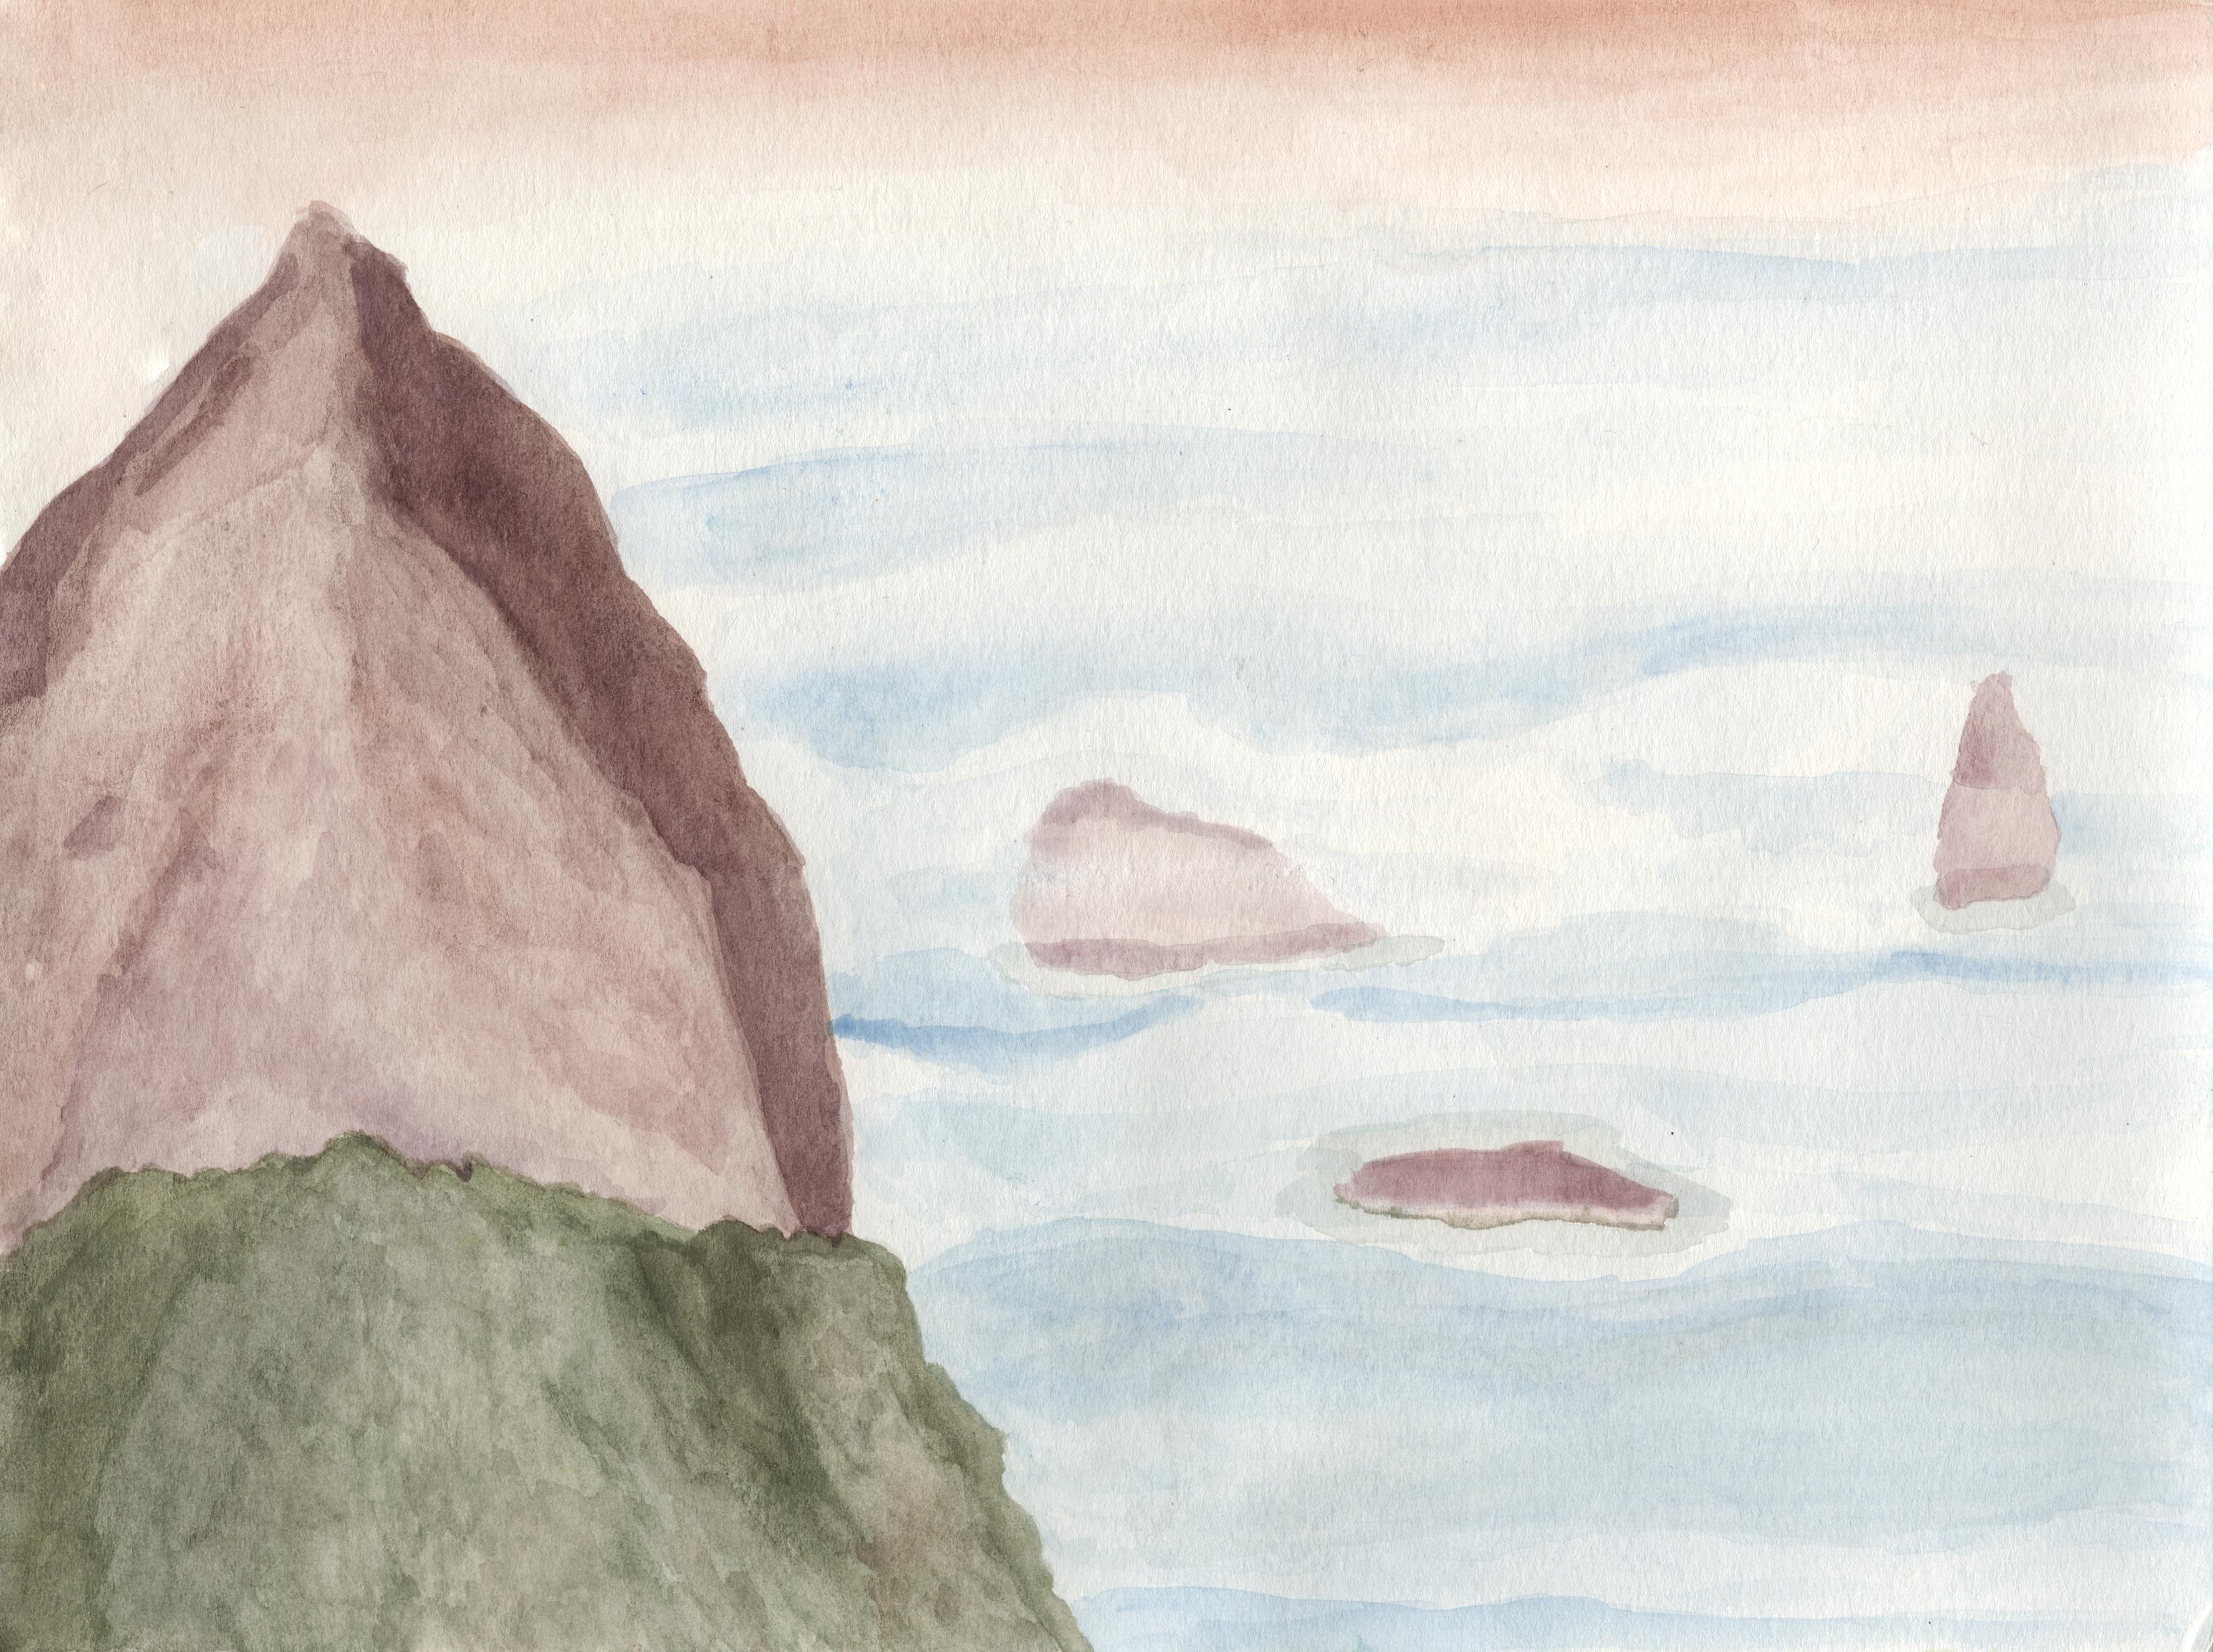 Ryōan-ji: Mountains in the Clouds